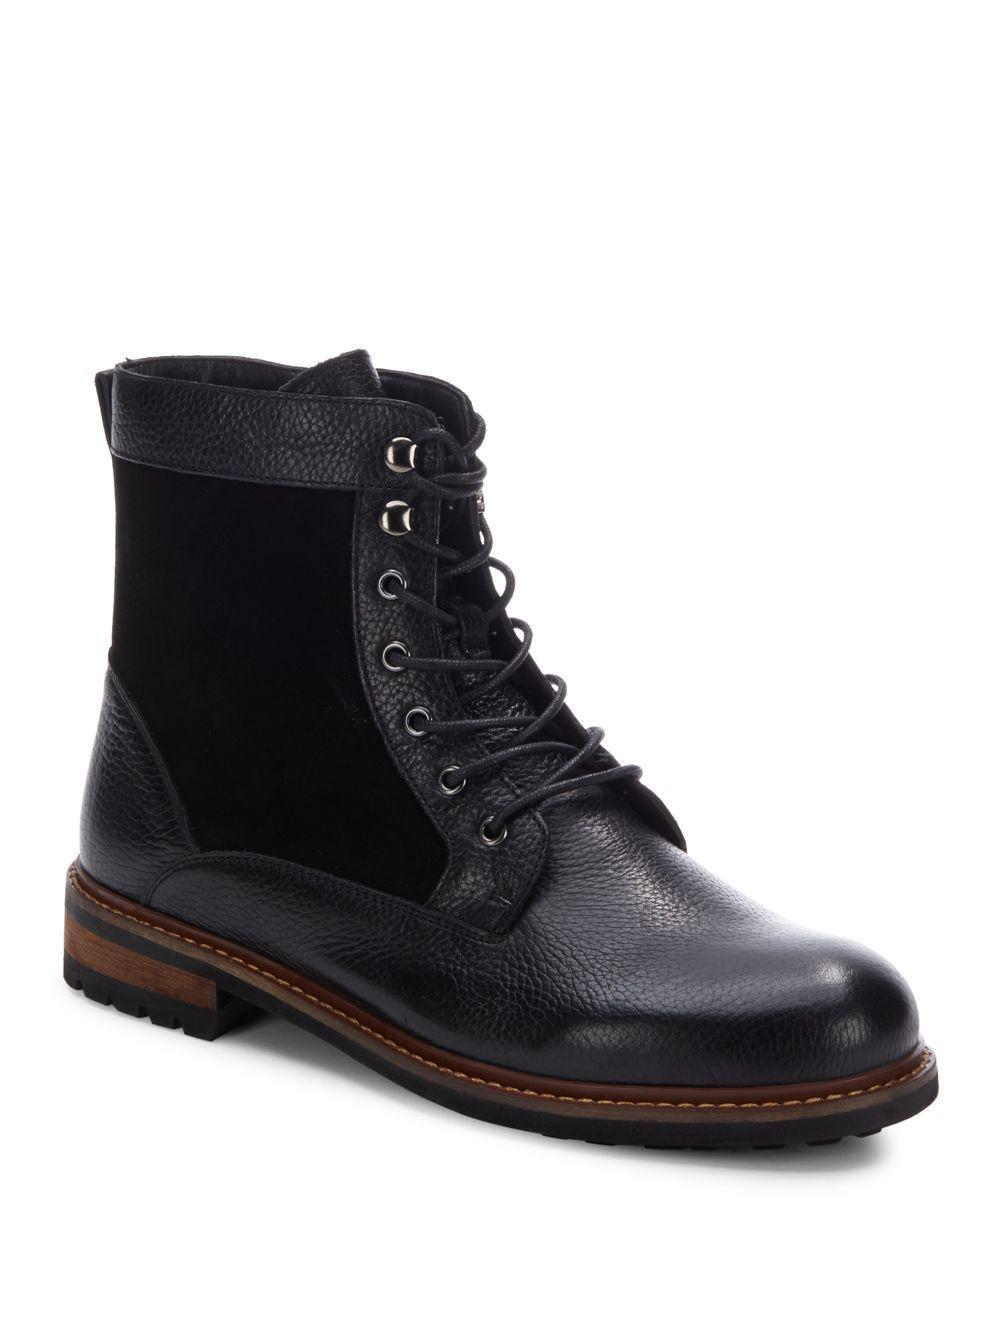 saks fifth avenue kramer leather suede boots in black